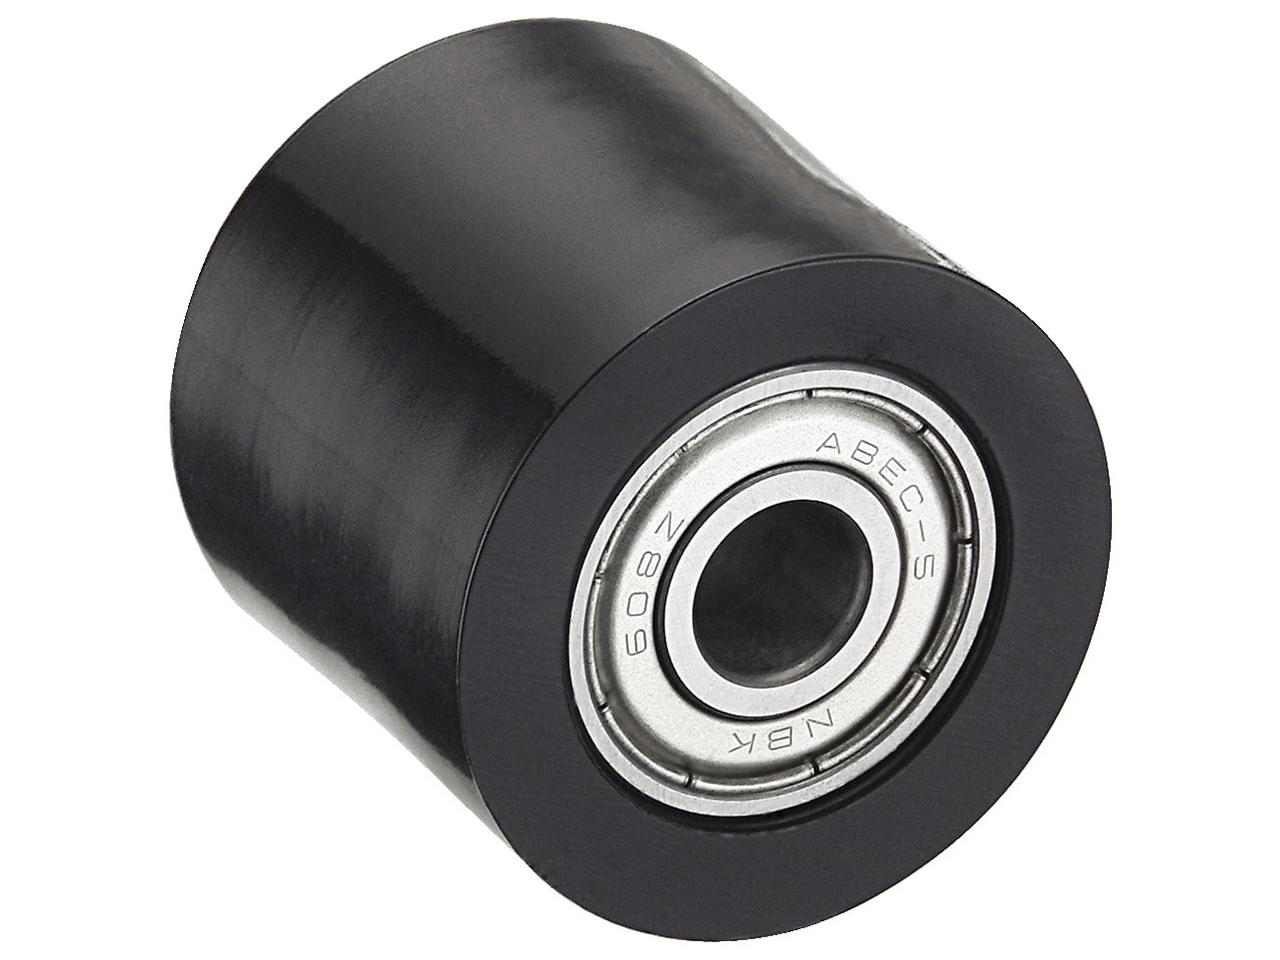 Roleto de corrente universal 32x29 furo de 8mm